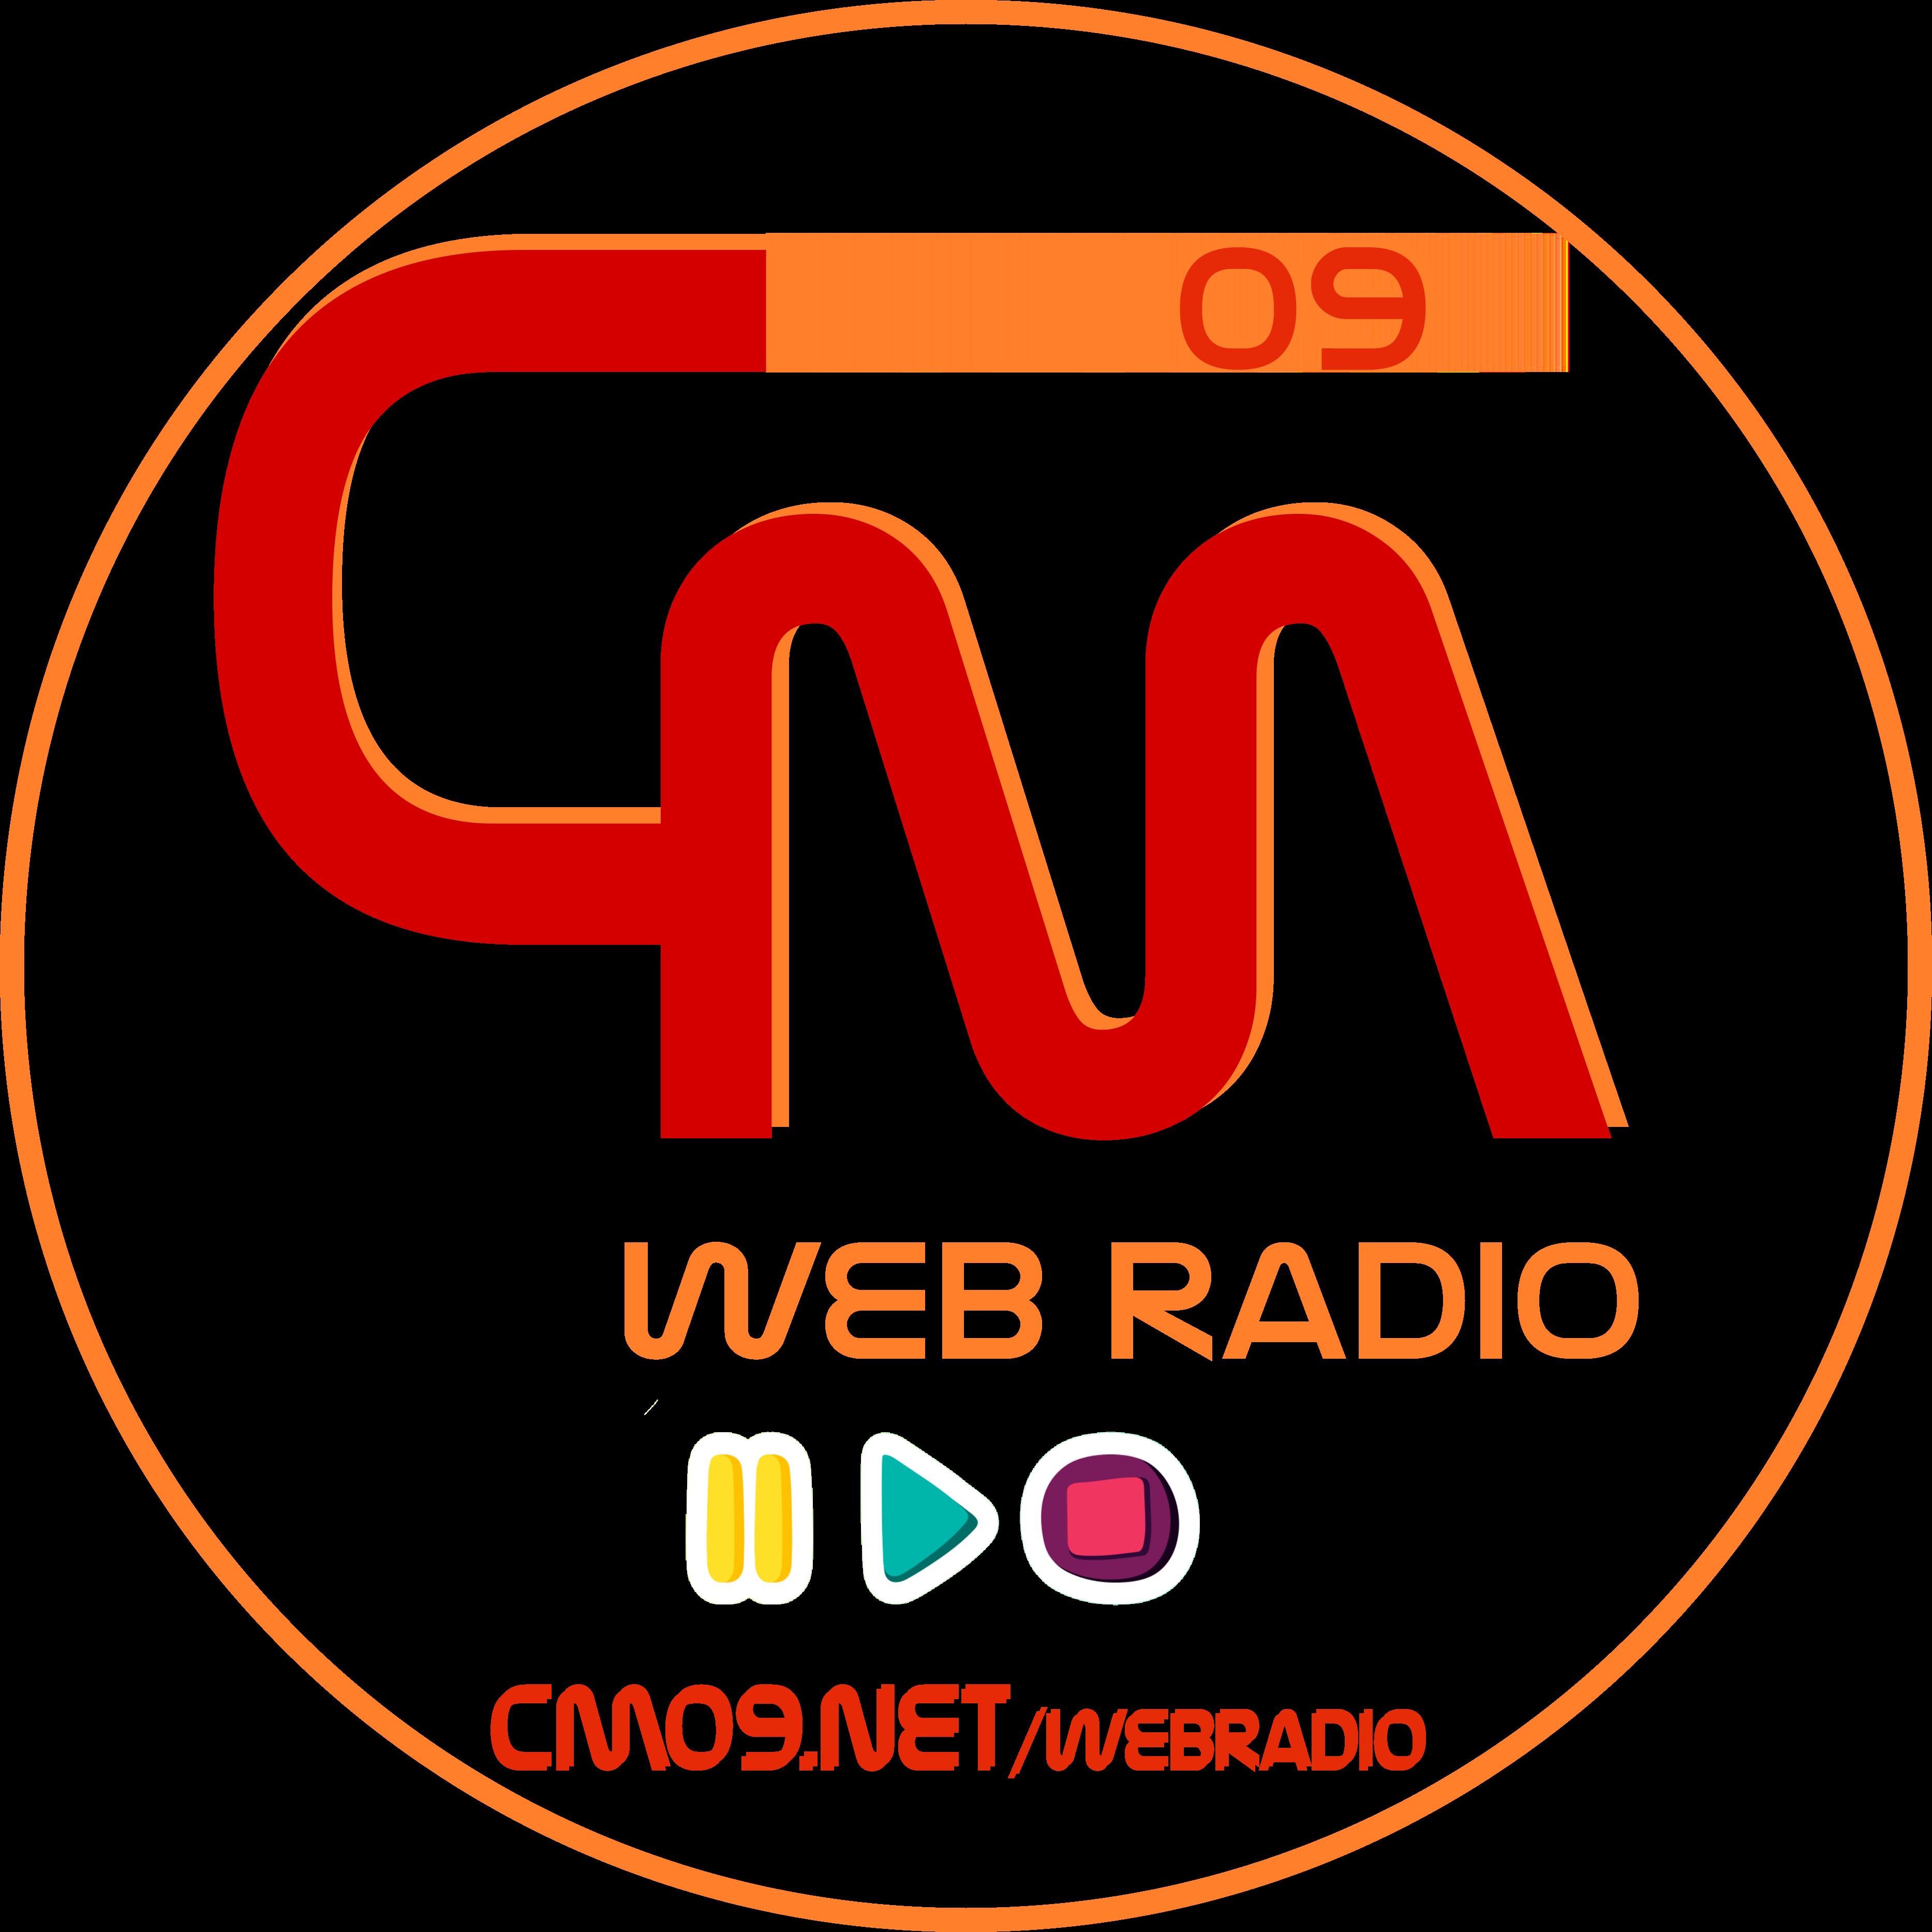 CM09 WEB RADIO